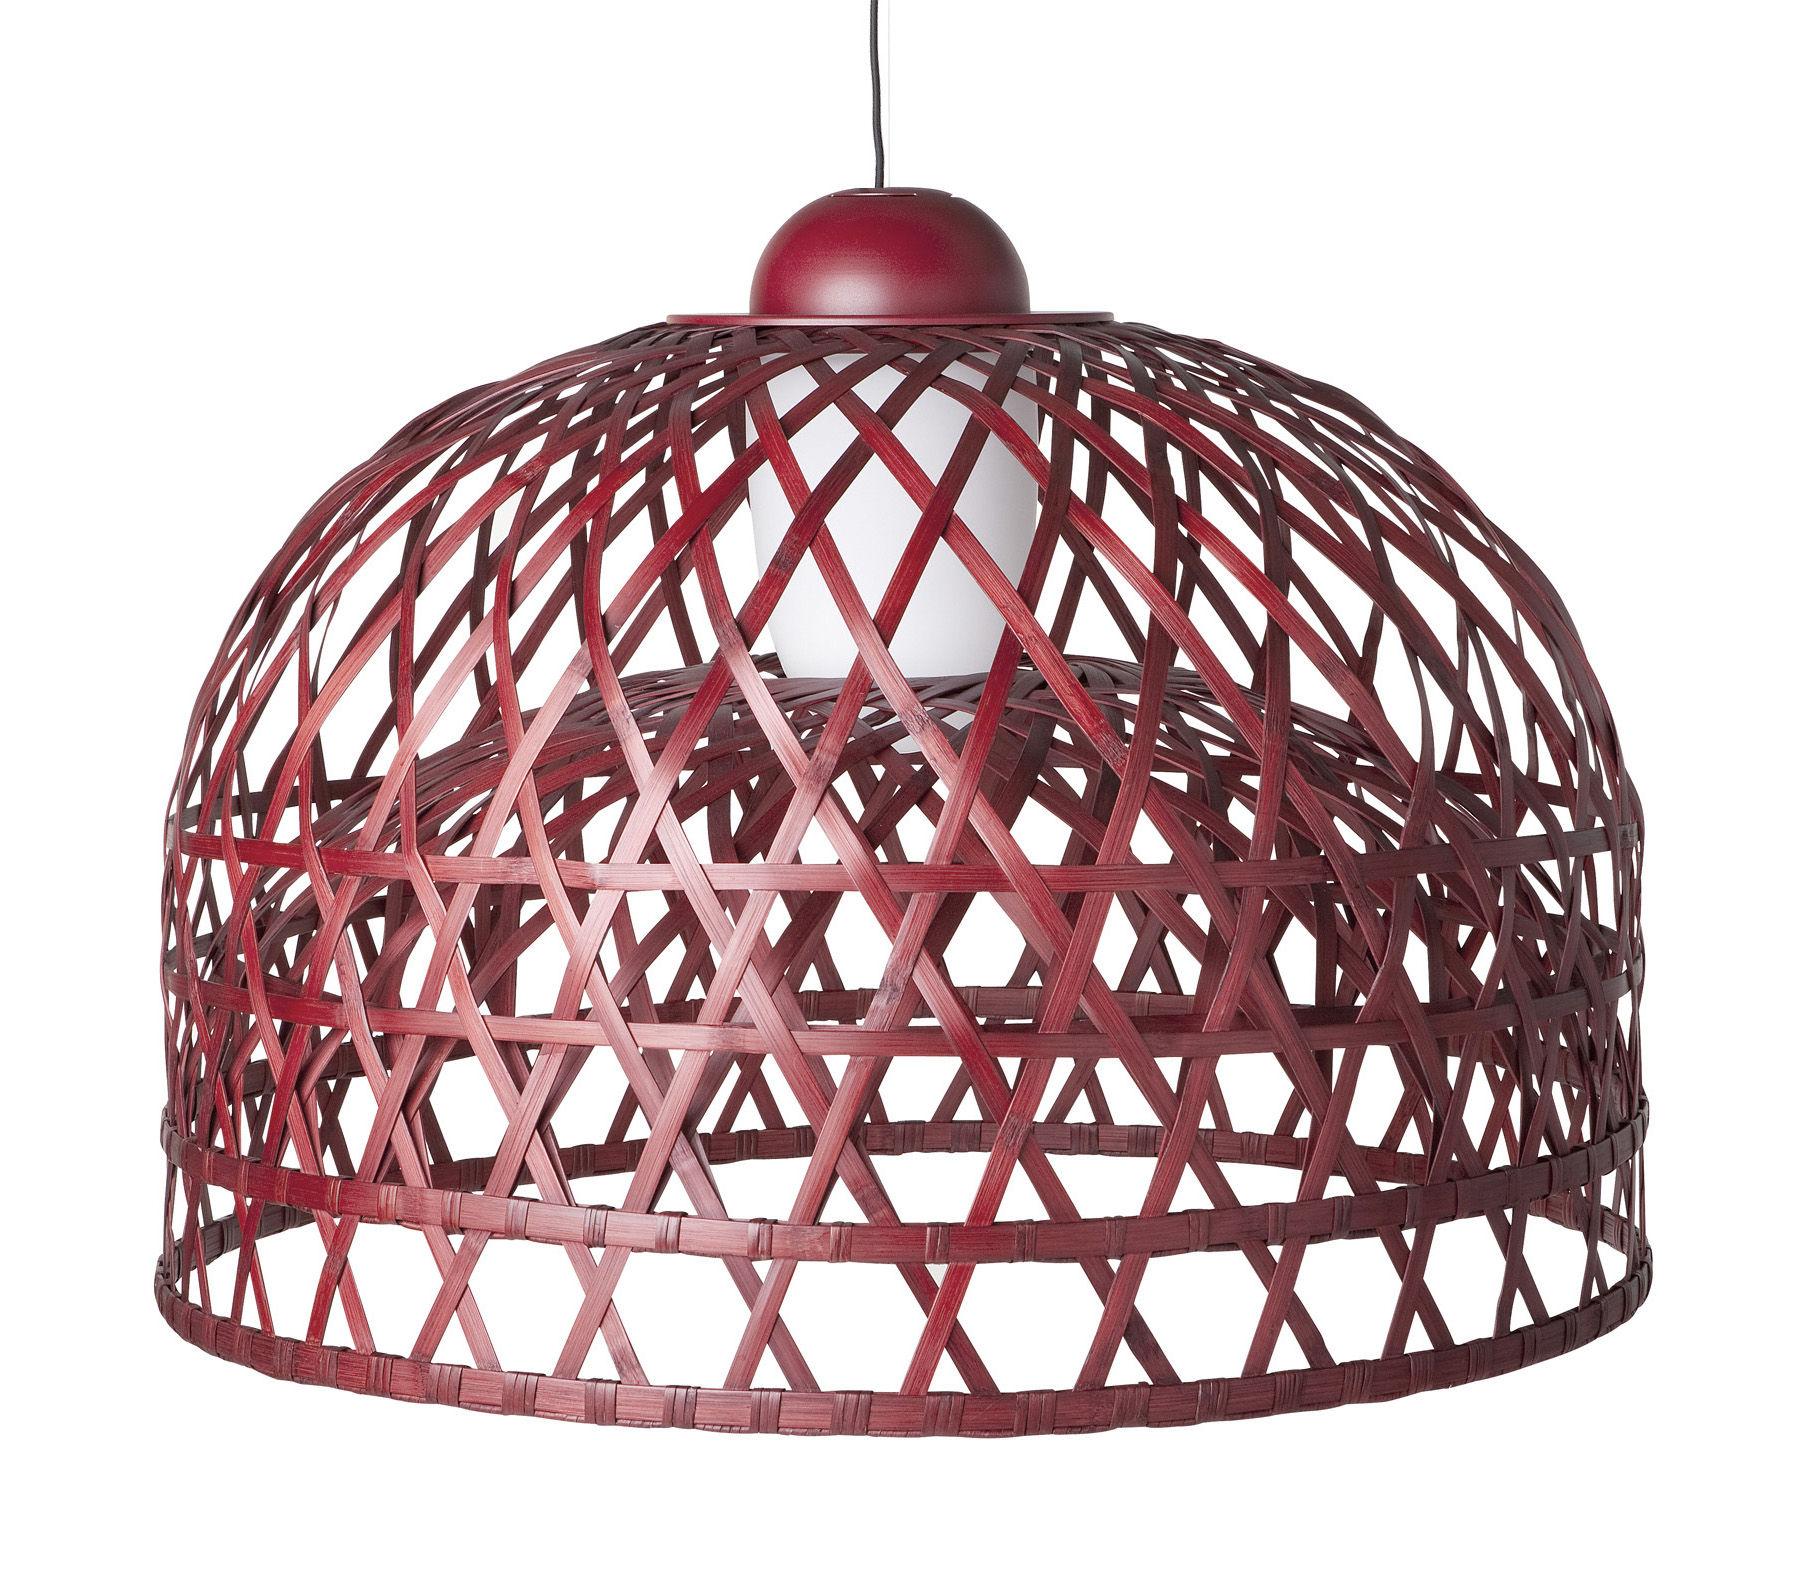 Illuminazione - Lampadari - Sospensione Emperor - Medium di Moooi - Ø 100 cm - Rosso - Alluminio, Midollino